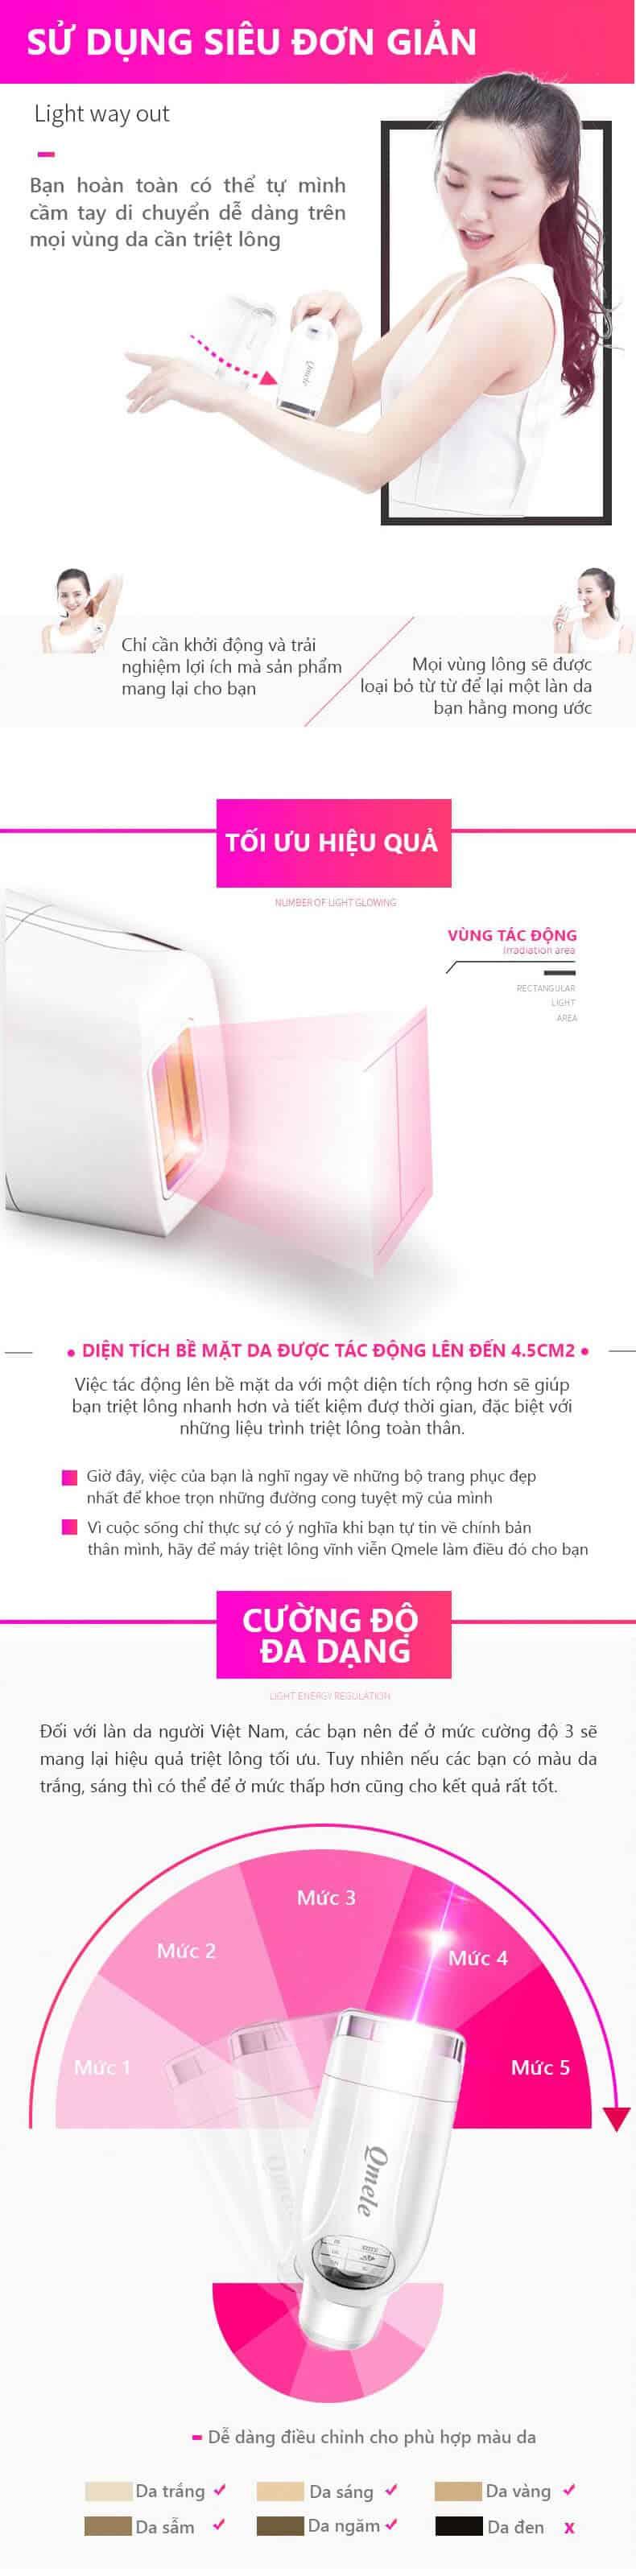 6c1609b1-may-triet-long-qmele-product-04